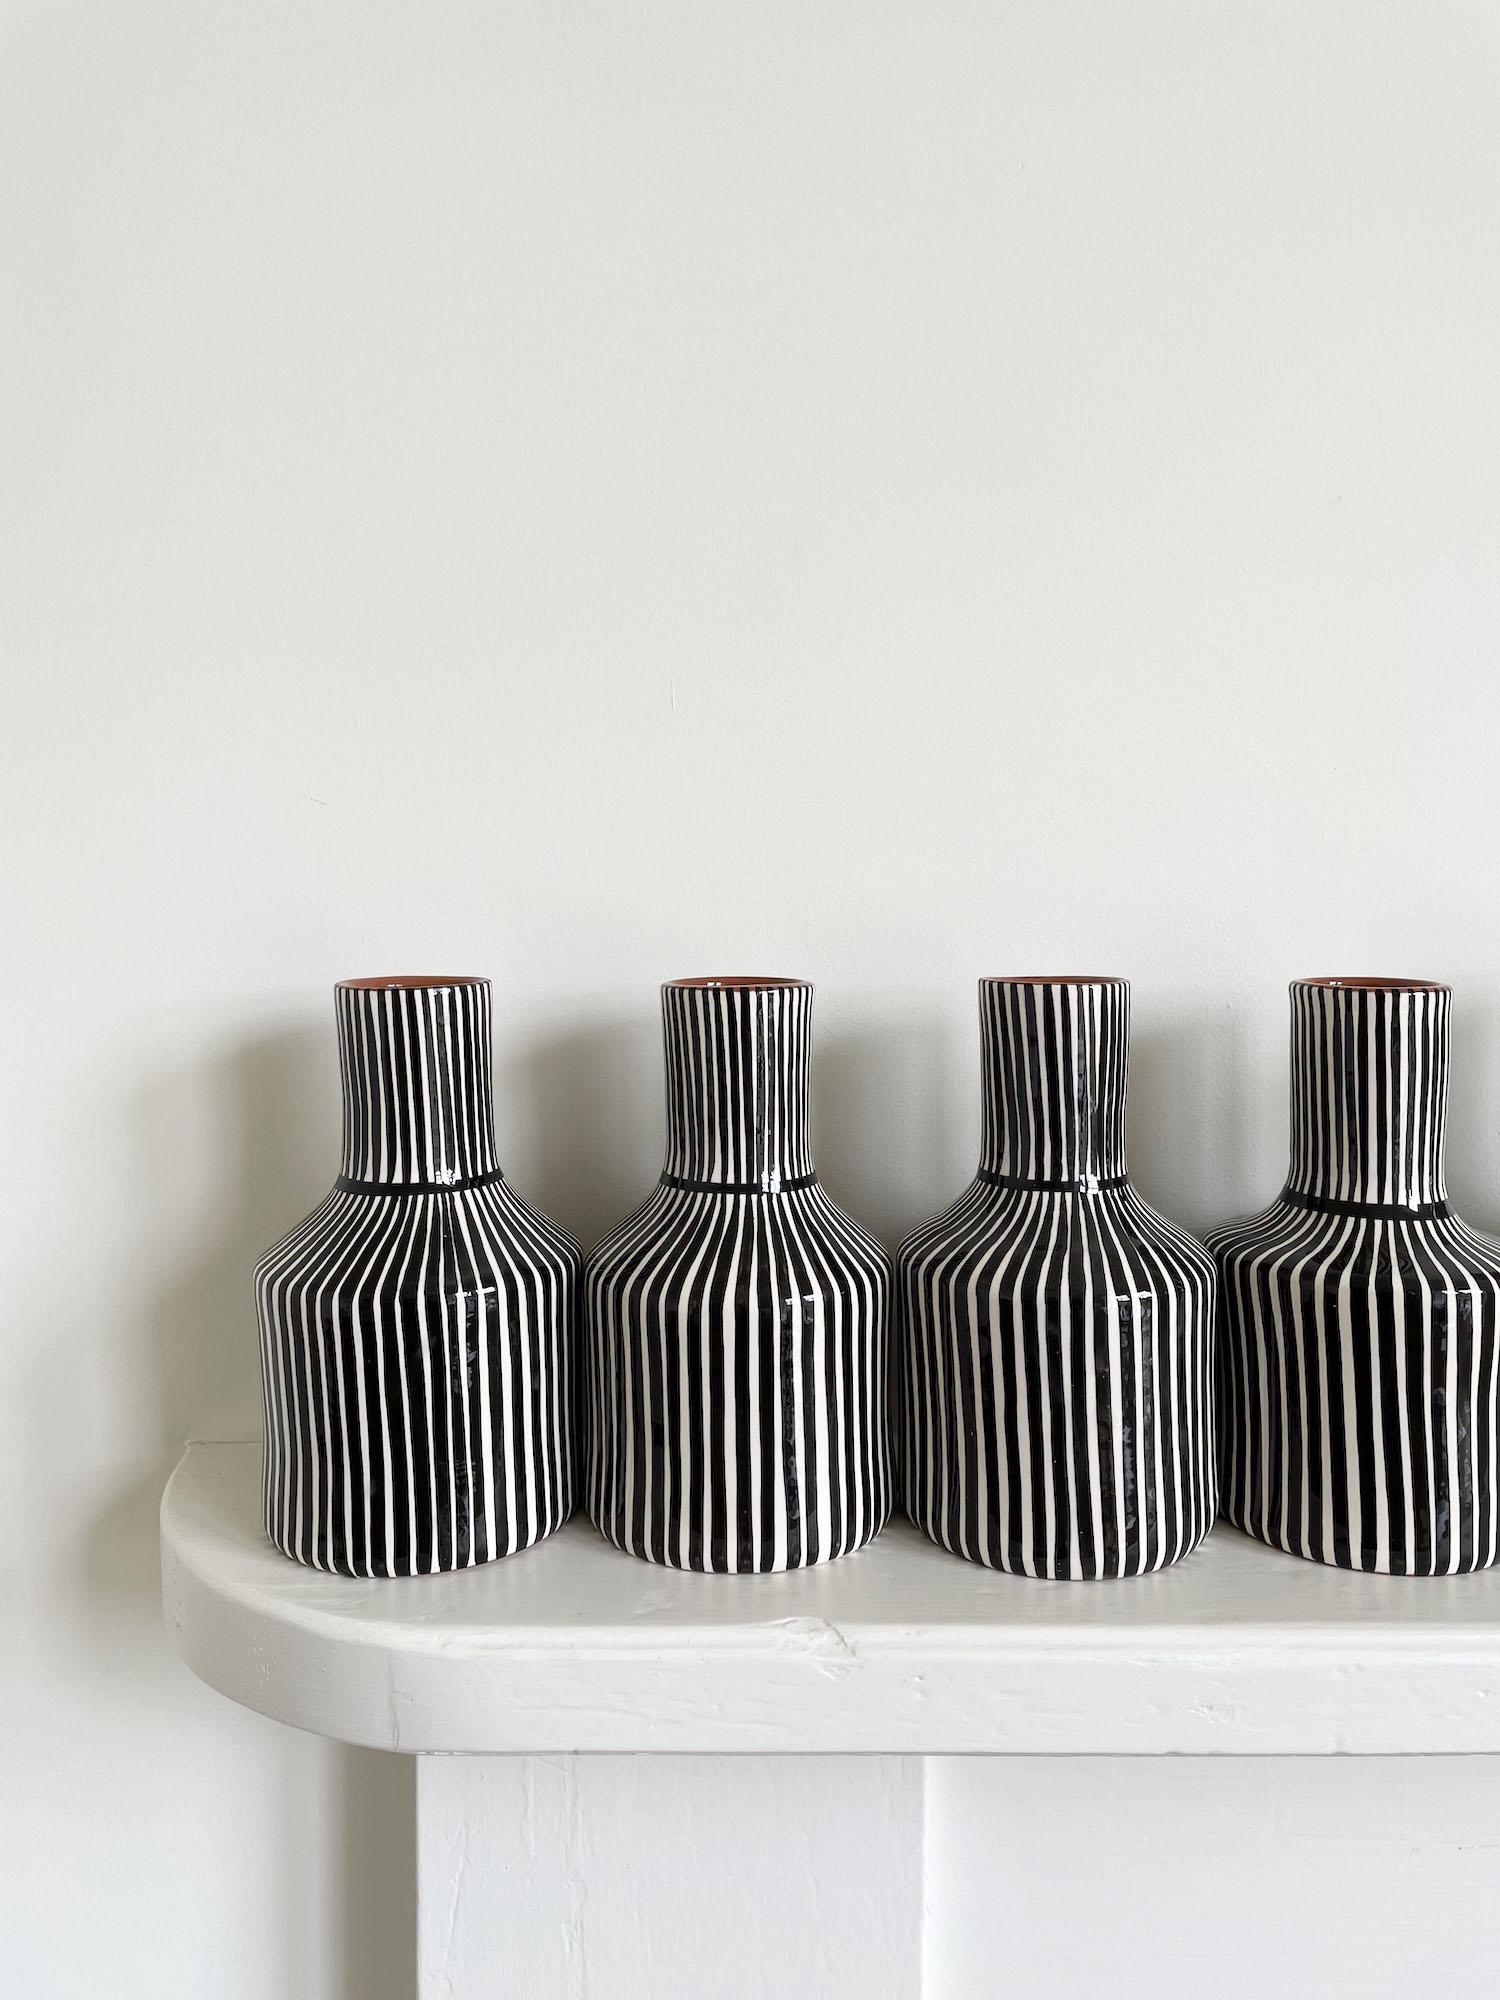 Striped Terracotta Vase  - Handmade in Portugal - Black or Green